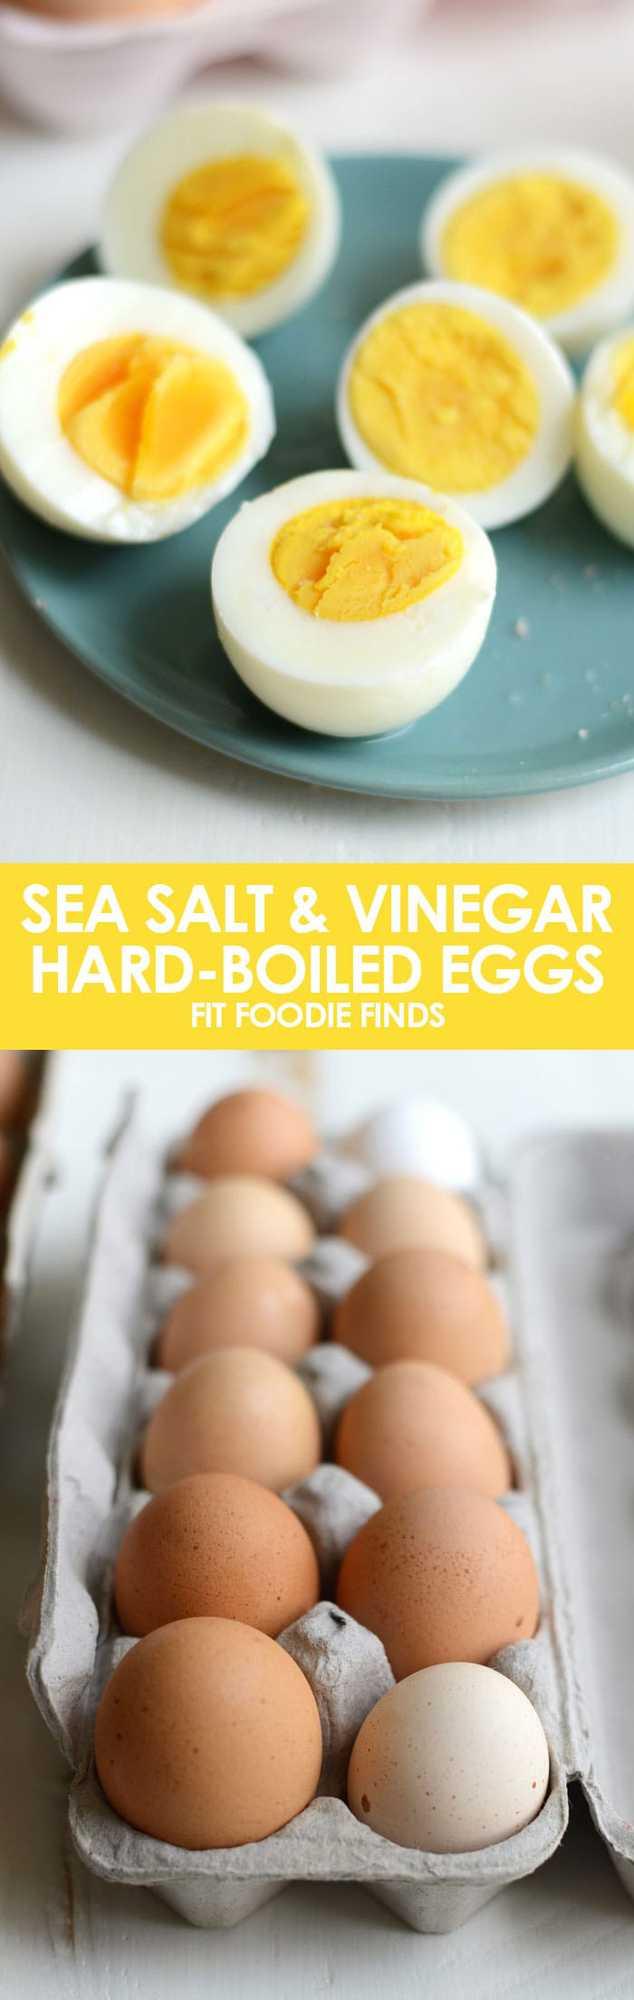 Sea Salt and Vinegar Hard-Boiled Eggs #healthy #recipe